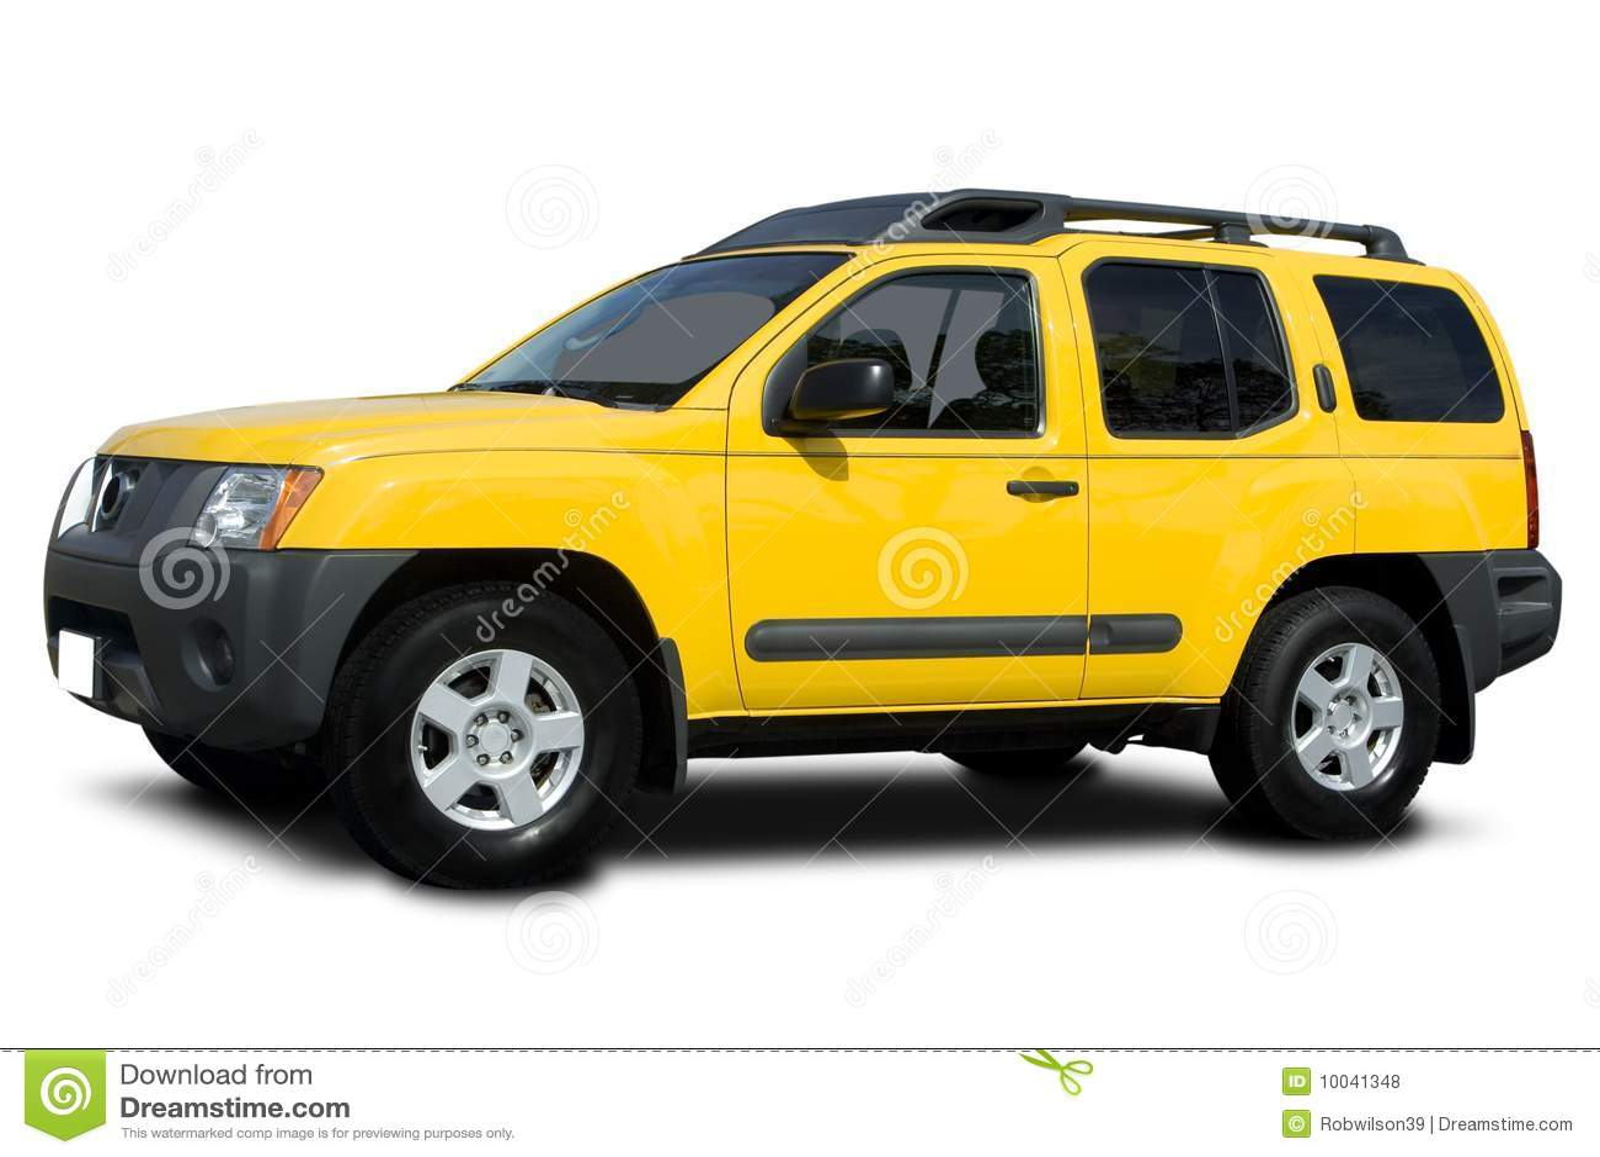 Yellow Suv Royalty Free Stock Photos Image